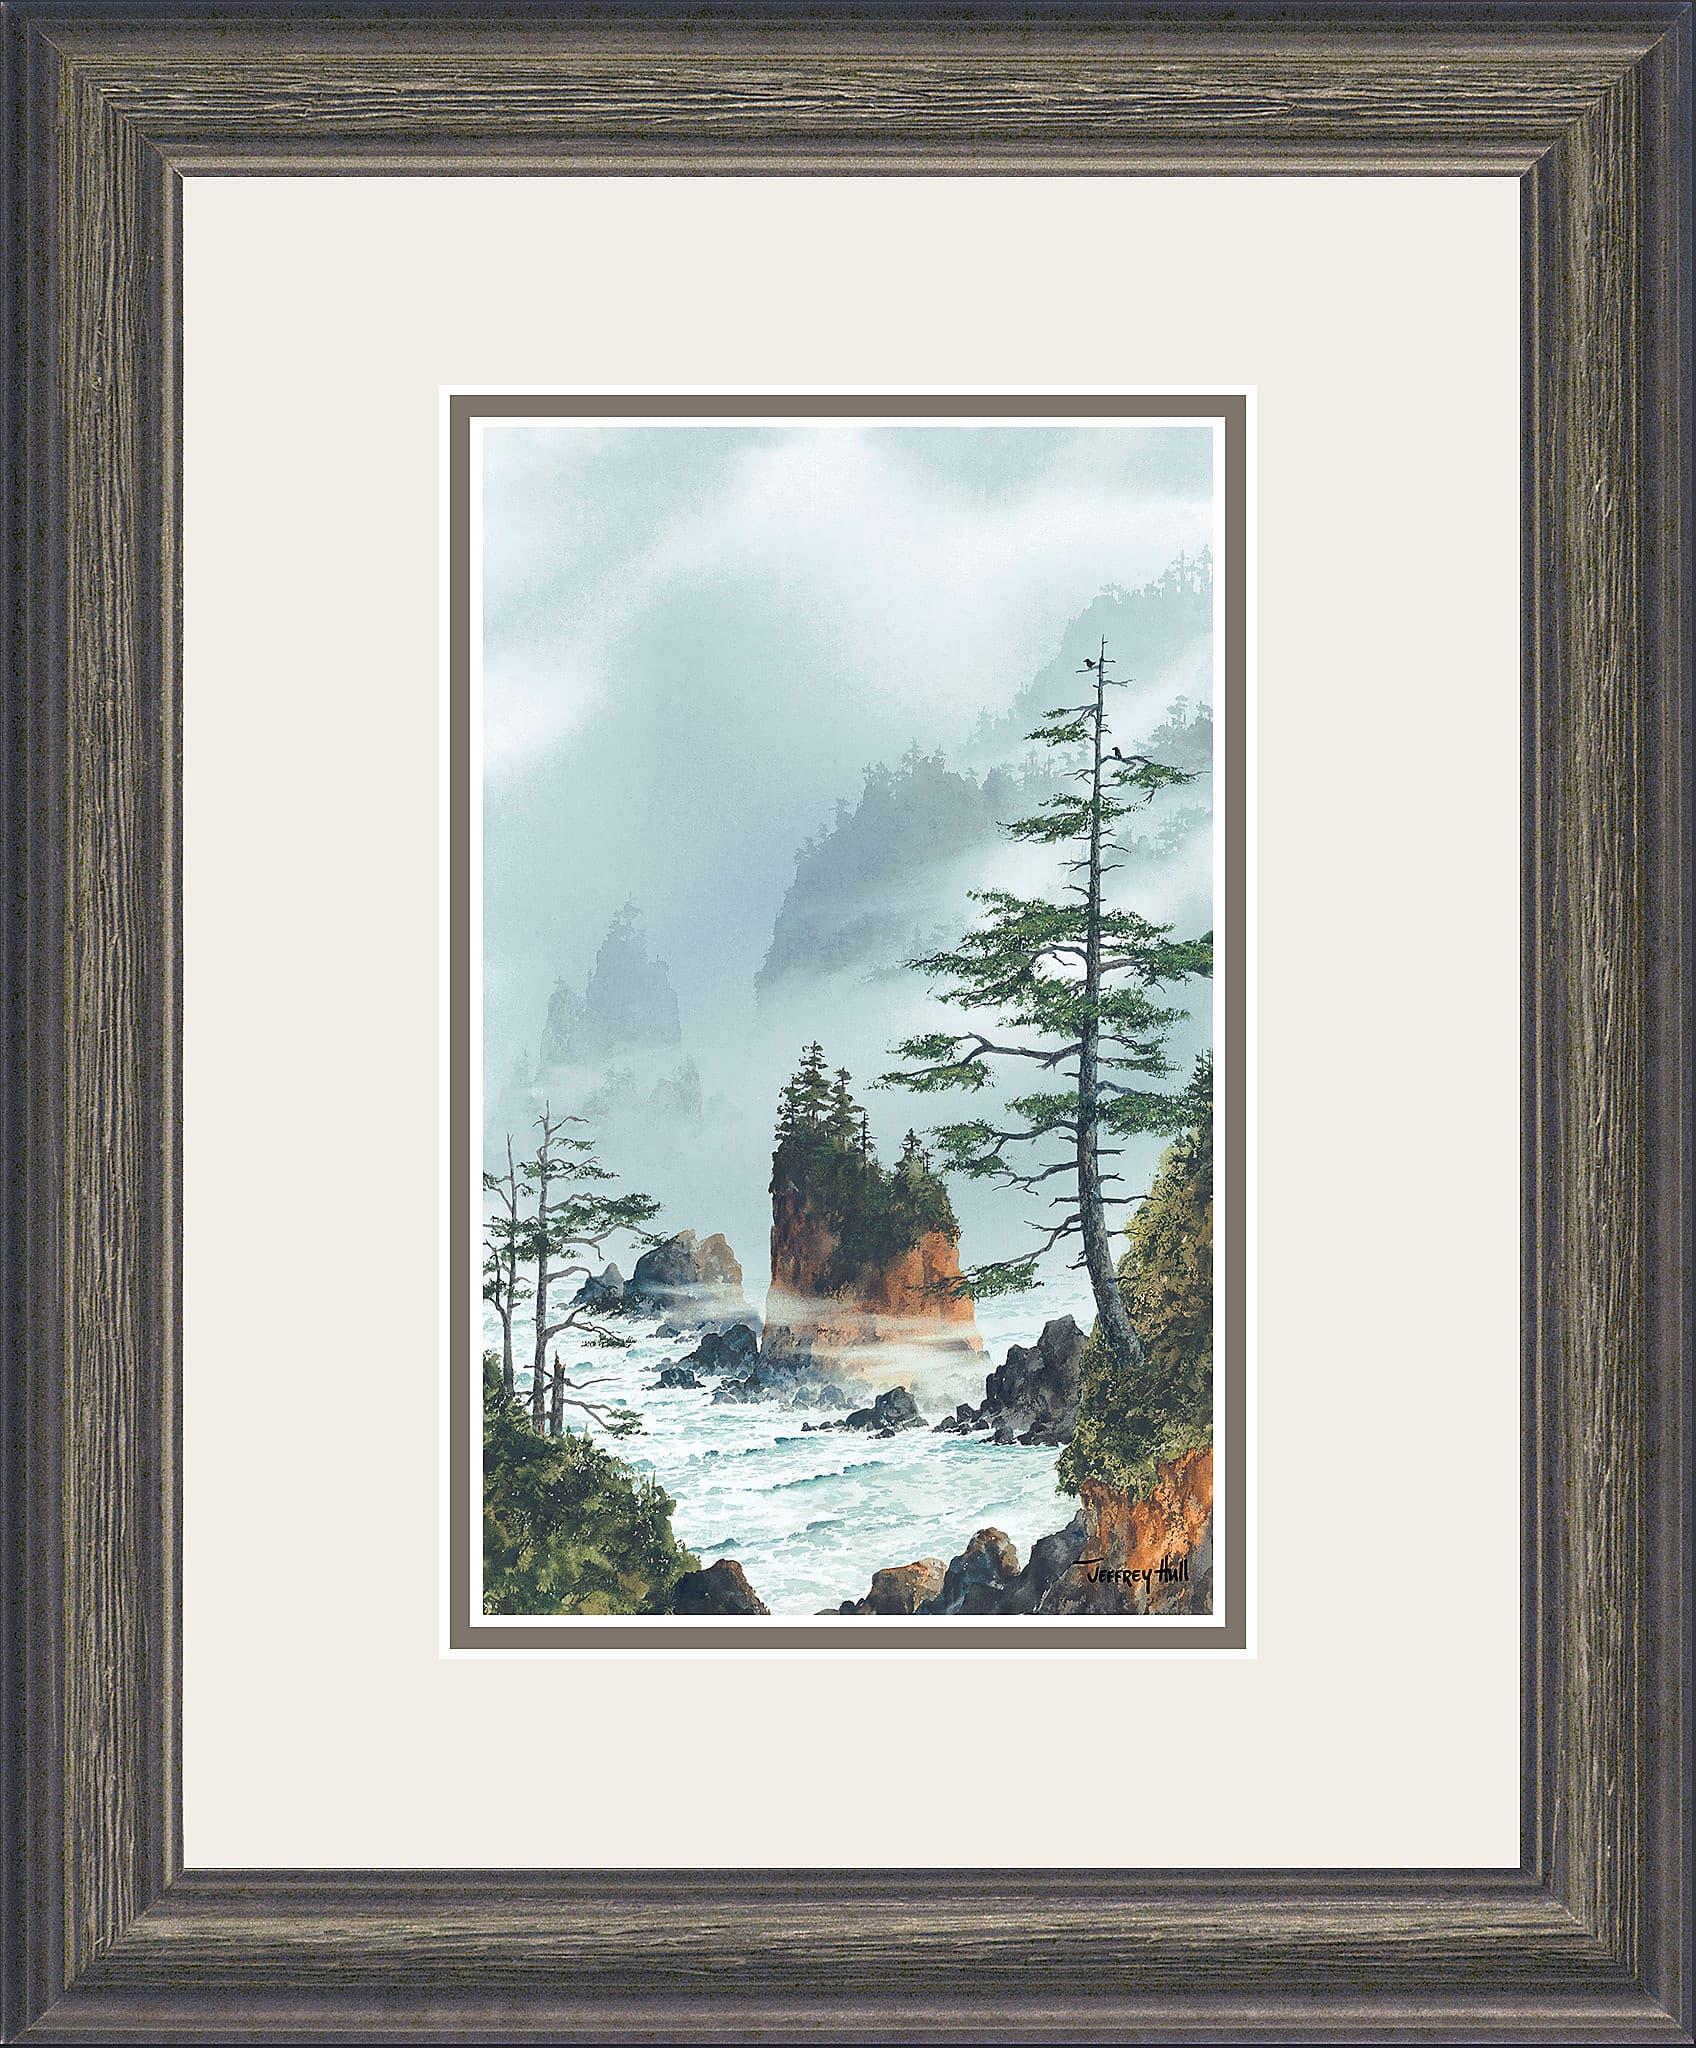 Foggy-Perch-Mini-Cascade-Talc-Balmoral-4-Website-2021